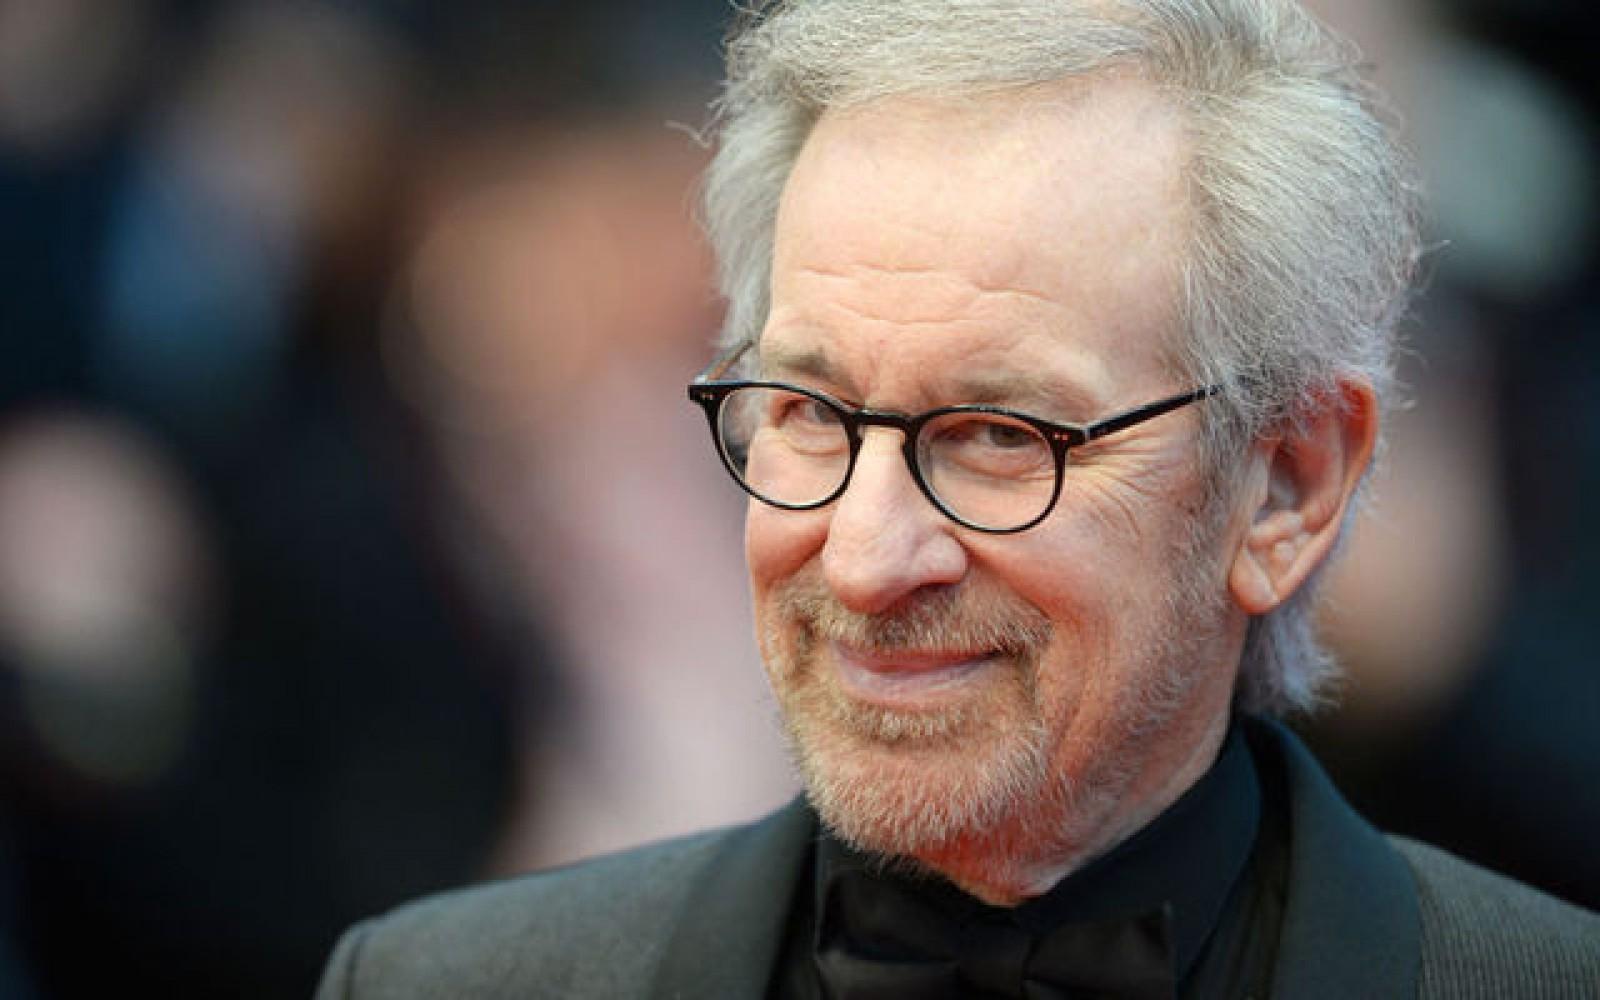 Record pentru Steven Spielberg: A trecut de 10 miliarde de dolari la box office